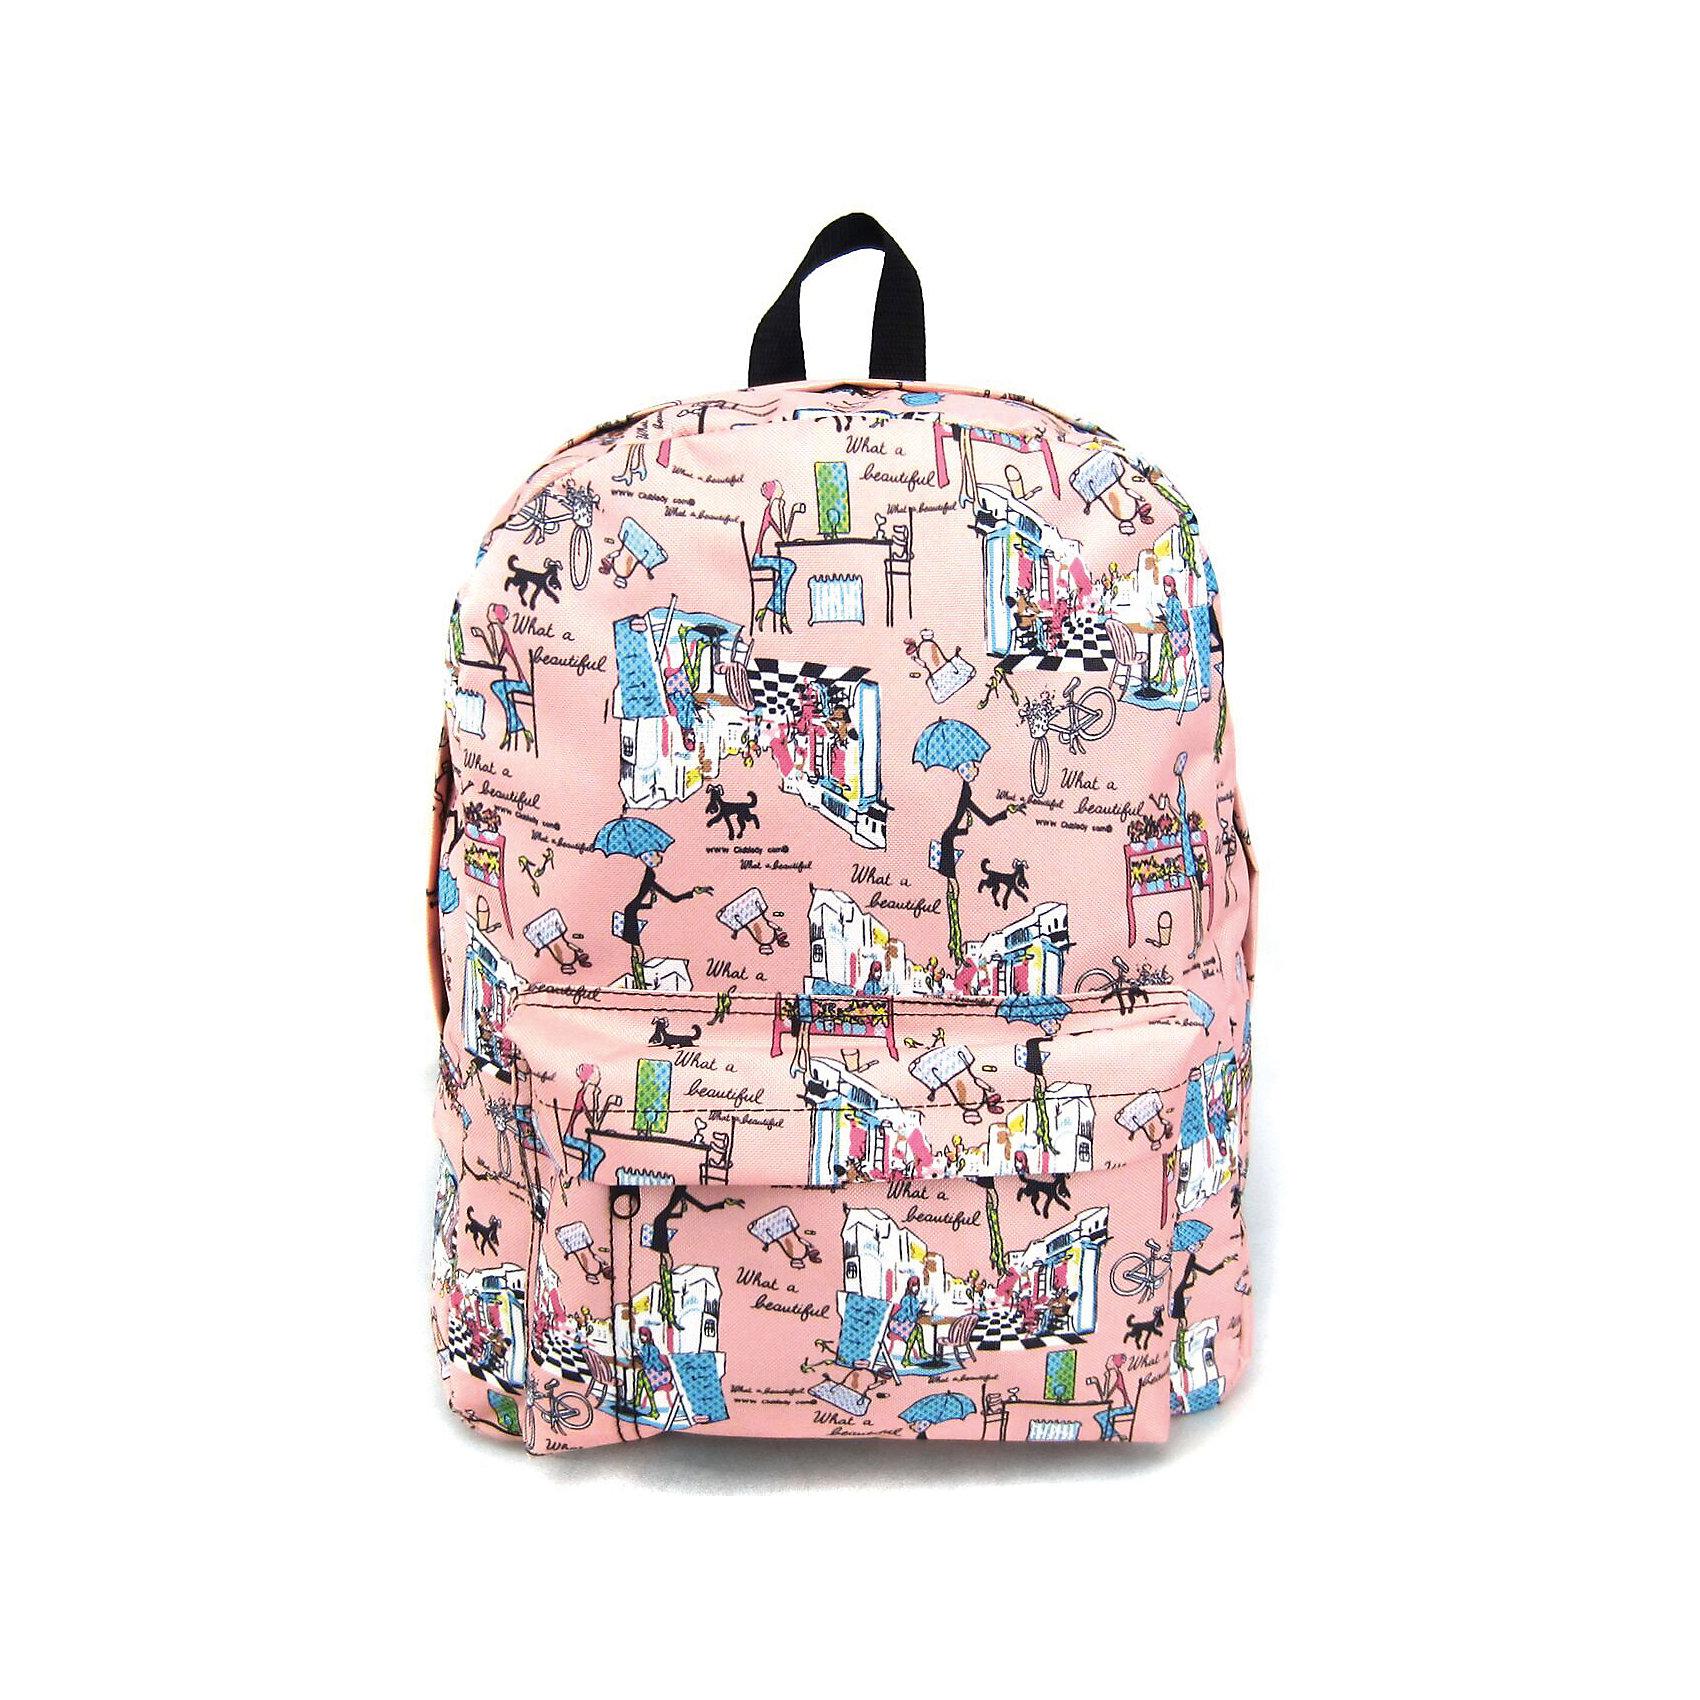 Рюкзак Модница с 1 карманом, цвет розовыйРюкзаки<br>Вес: 0,3 кг<br>Размер: 40х32х13 см<br>Состав: рюкзак<br>Наличие светоотражающих элементов: нет<br>Материал: полиэстер<br><br>Ширина мм: 400<br>Глубина мм: 320<br>Высота мм: 130<br>Вес г: 300<br>Возраст от месяцев: 84<br>Возраст до месяцев: 720<br>Пол: Унисекс<br>Возраст: Детский<br>SKU: 7054047